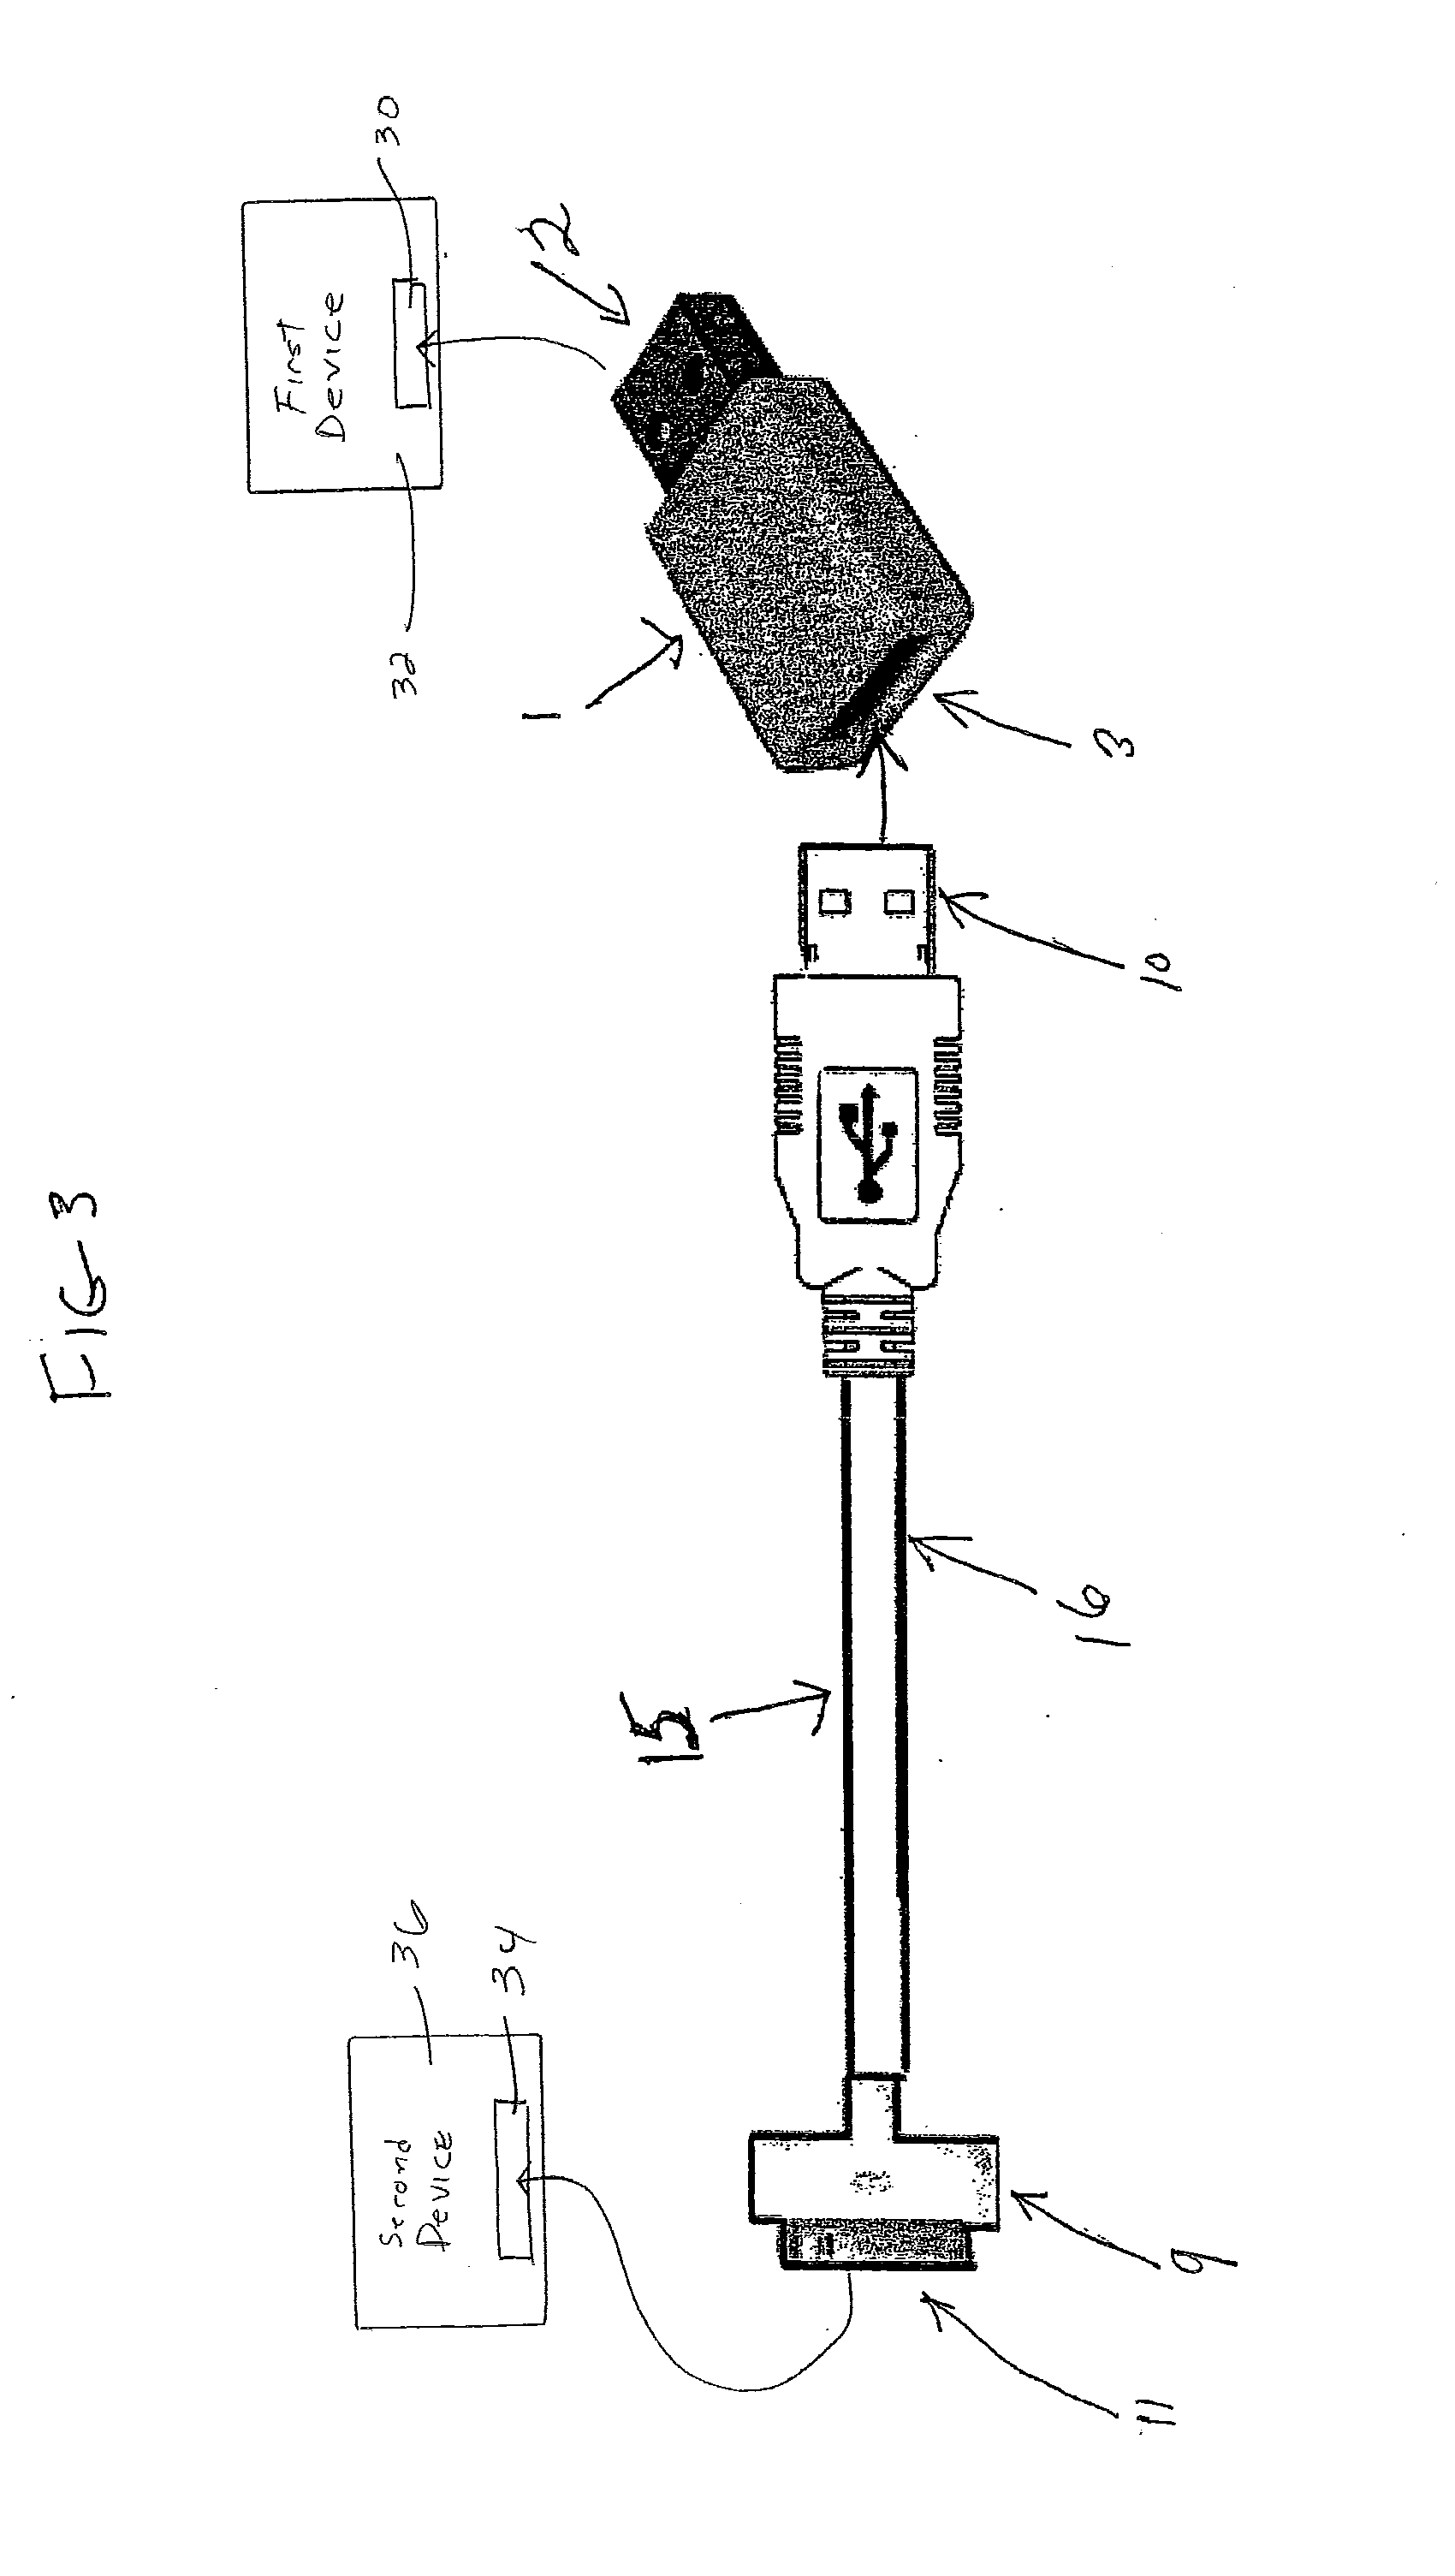 Usb Power Adapter For Nes